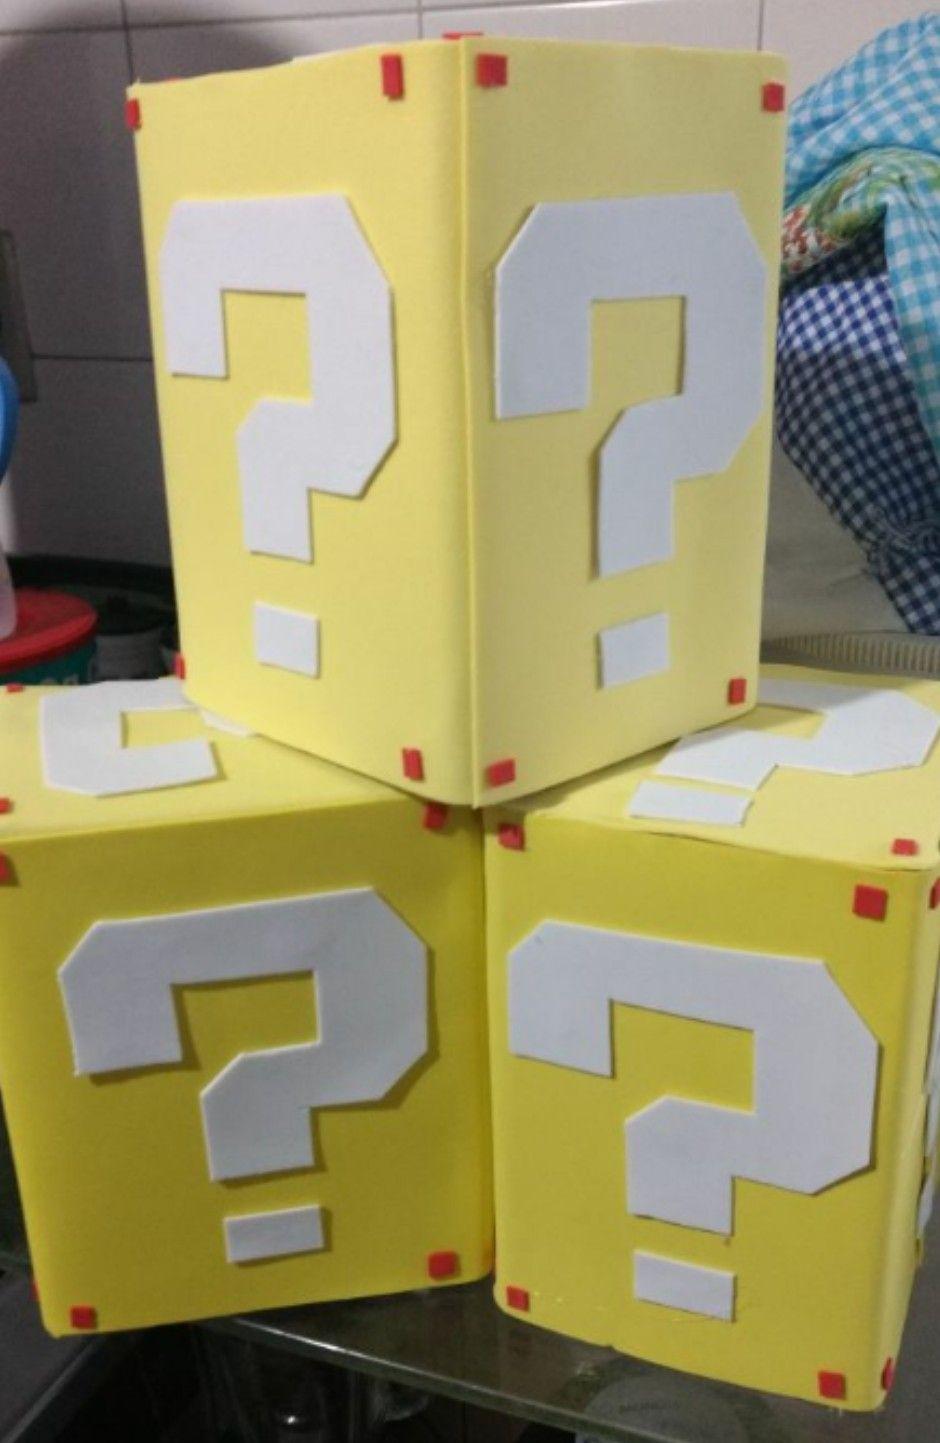 Caixas personalizadas com EVA Super Mario Bros Super Mario